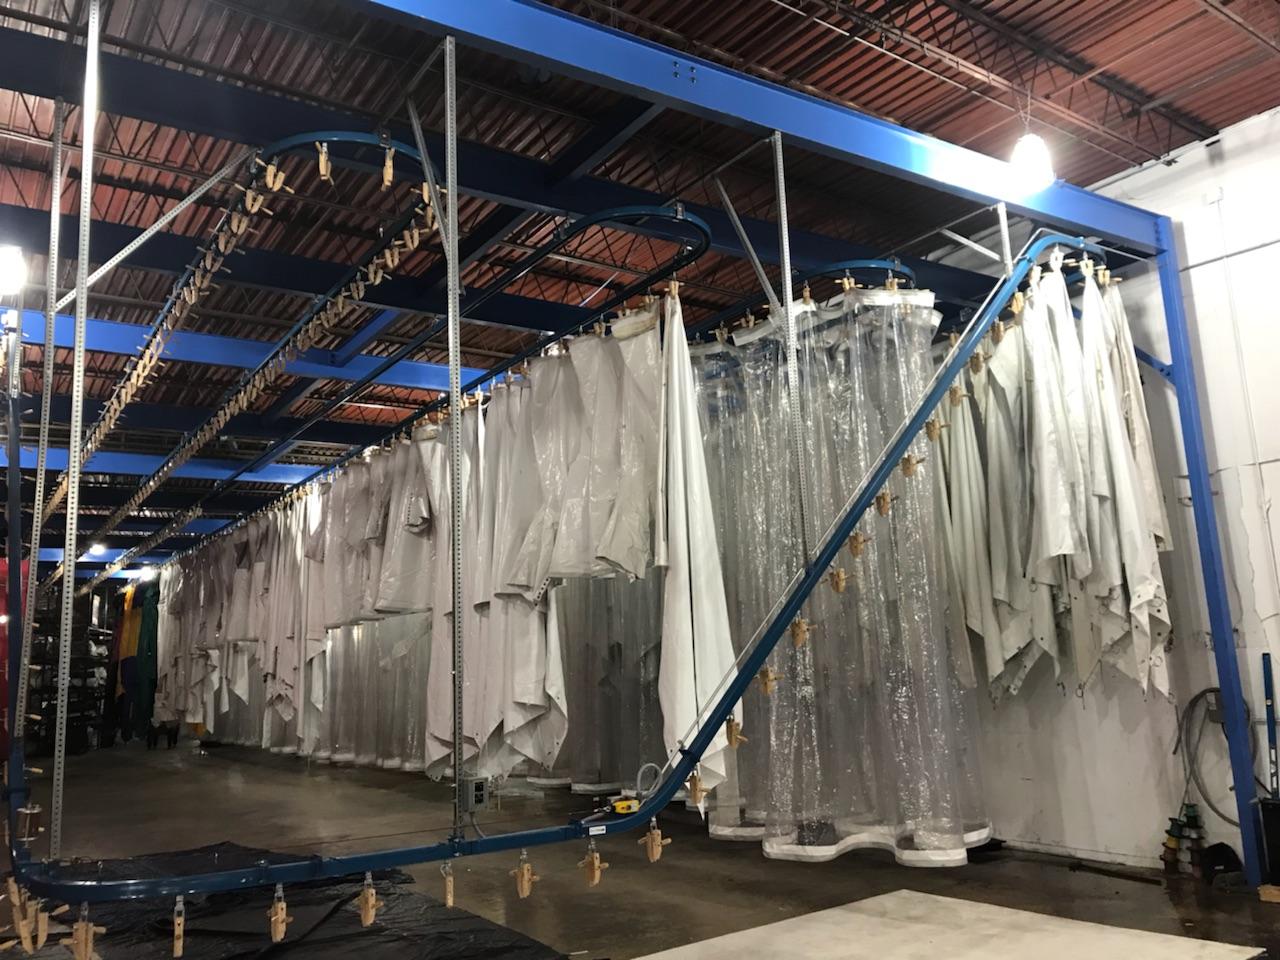 Mahaffey's fabric drying system